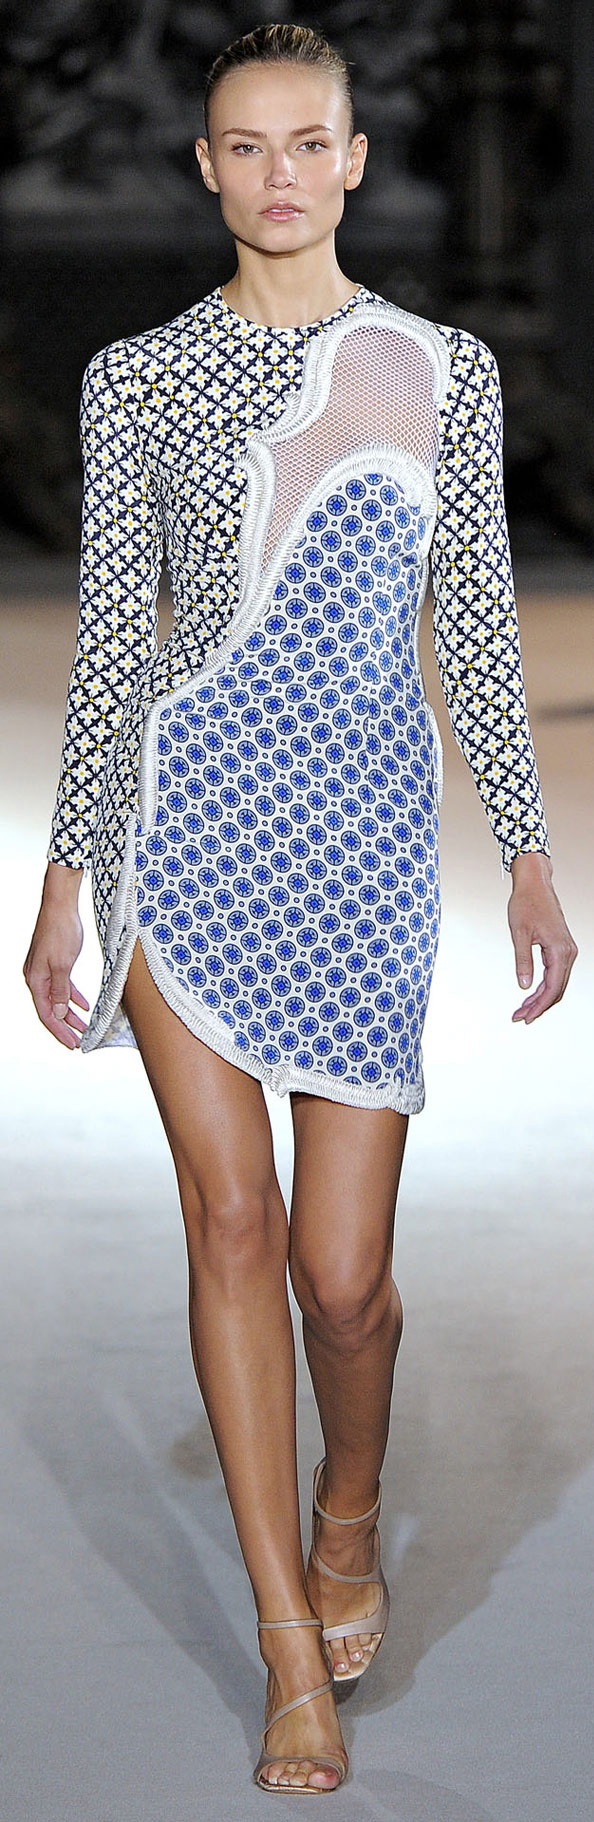 Stella McCartney Spring Summer 2012. Fashion shows. Paris